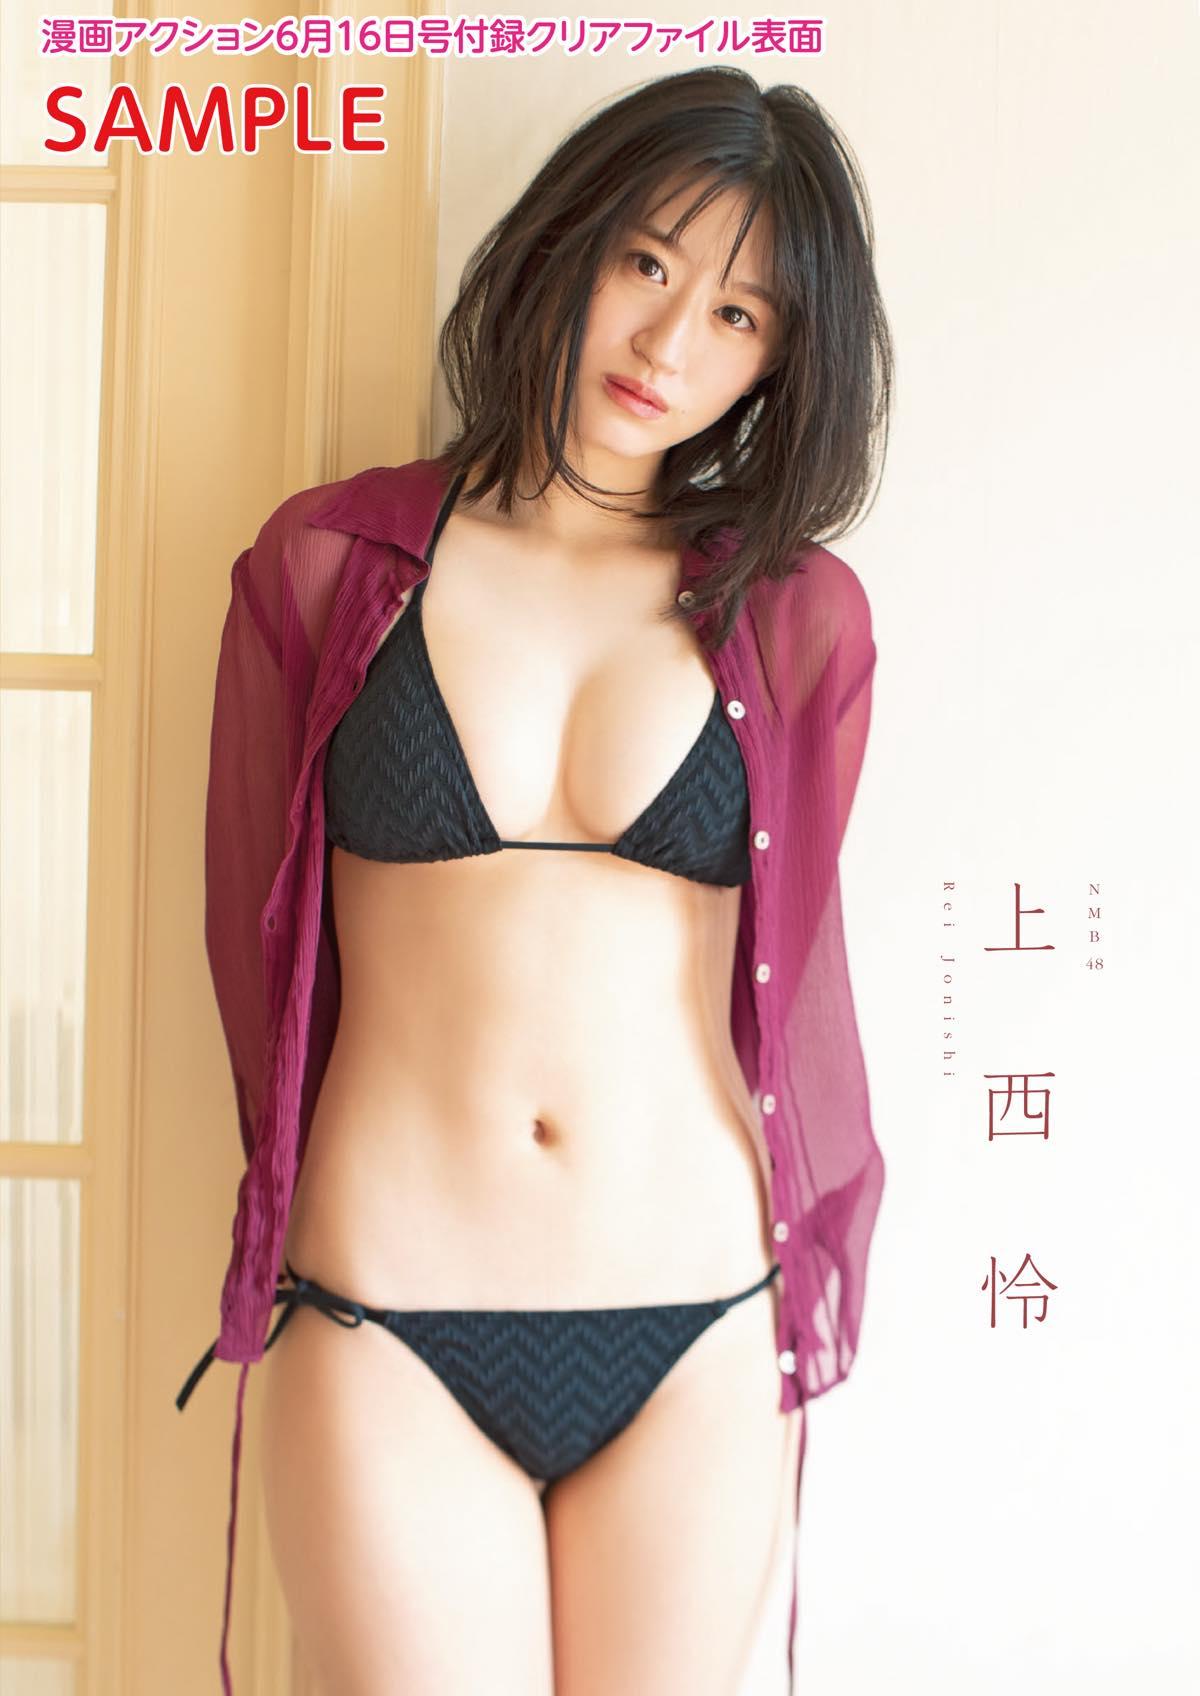 NMB48上西怜が『漫画アクション』の表紙巻頭グラビアに登場! 【写真4枚】の画像003